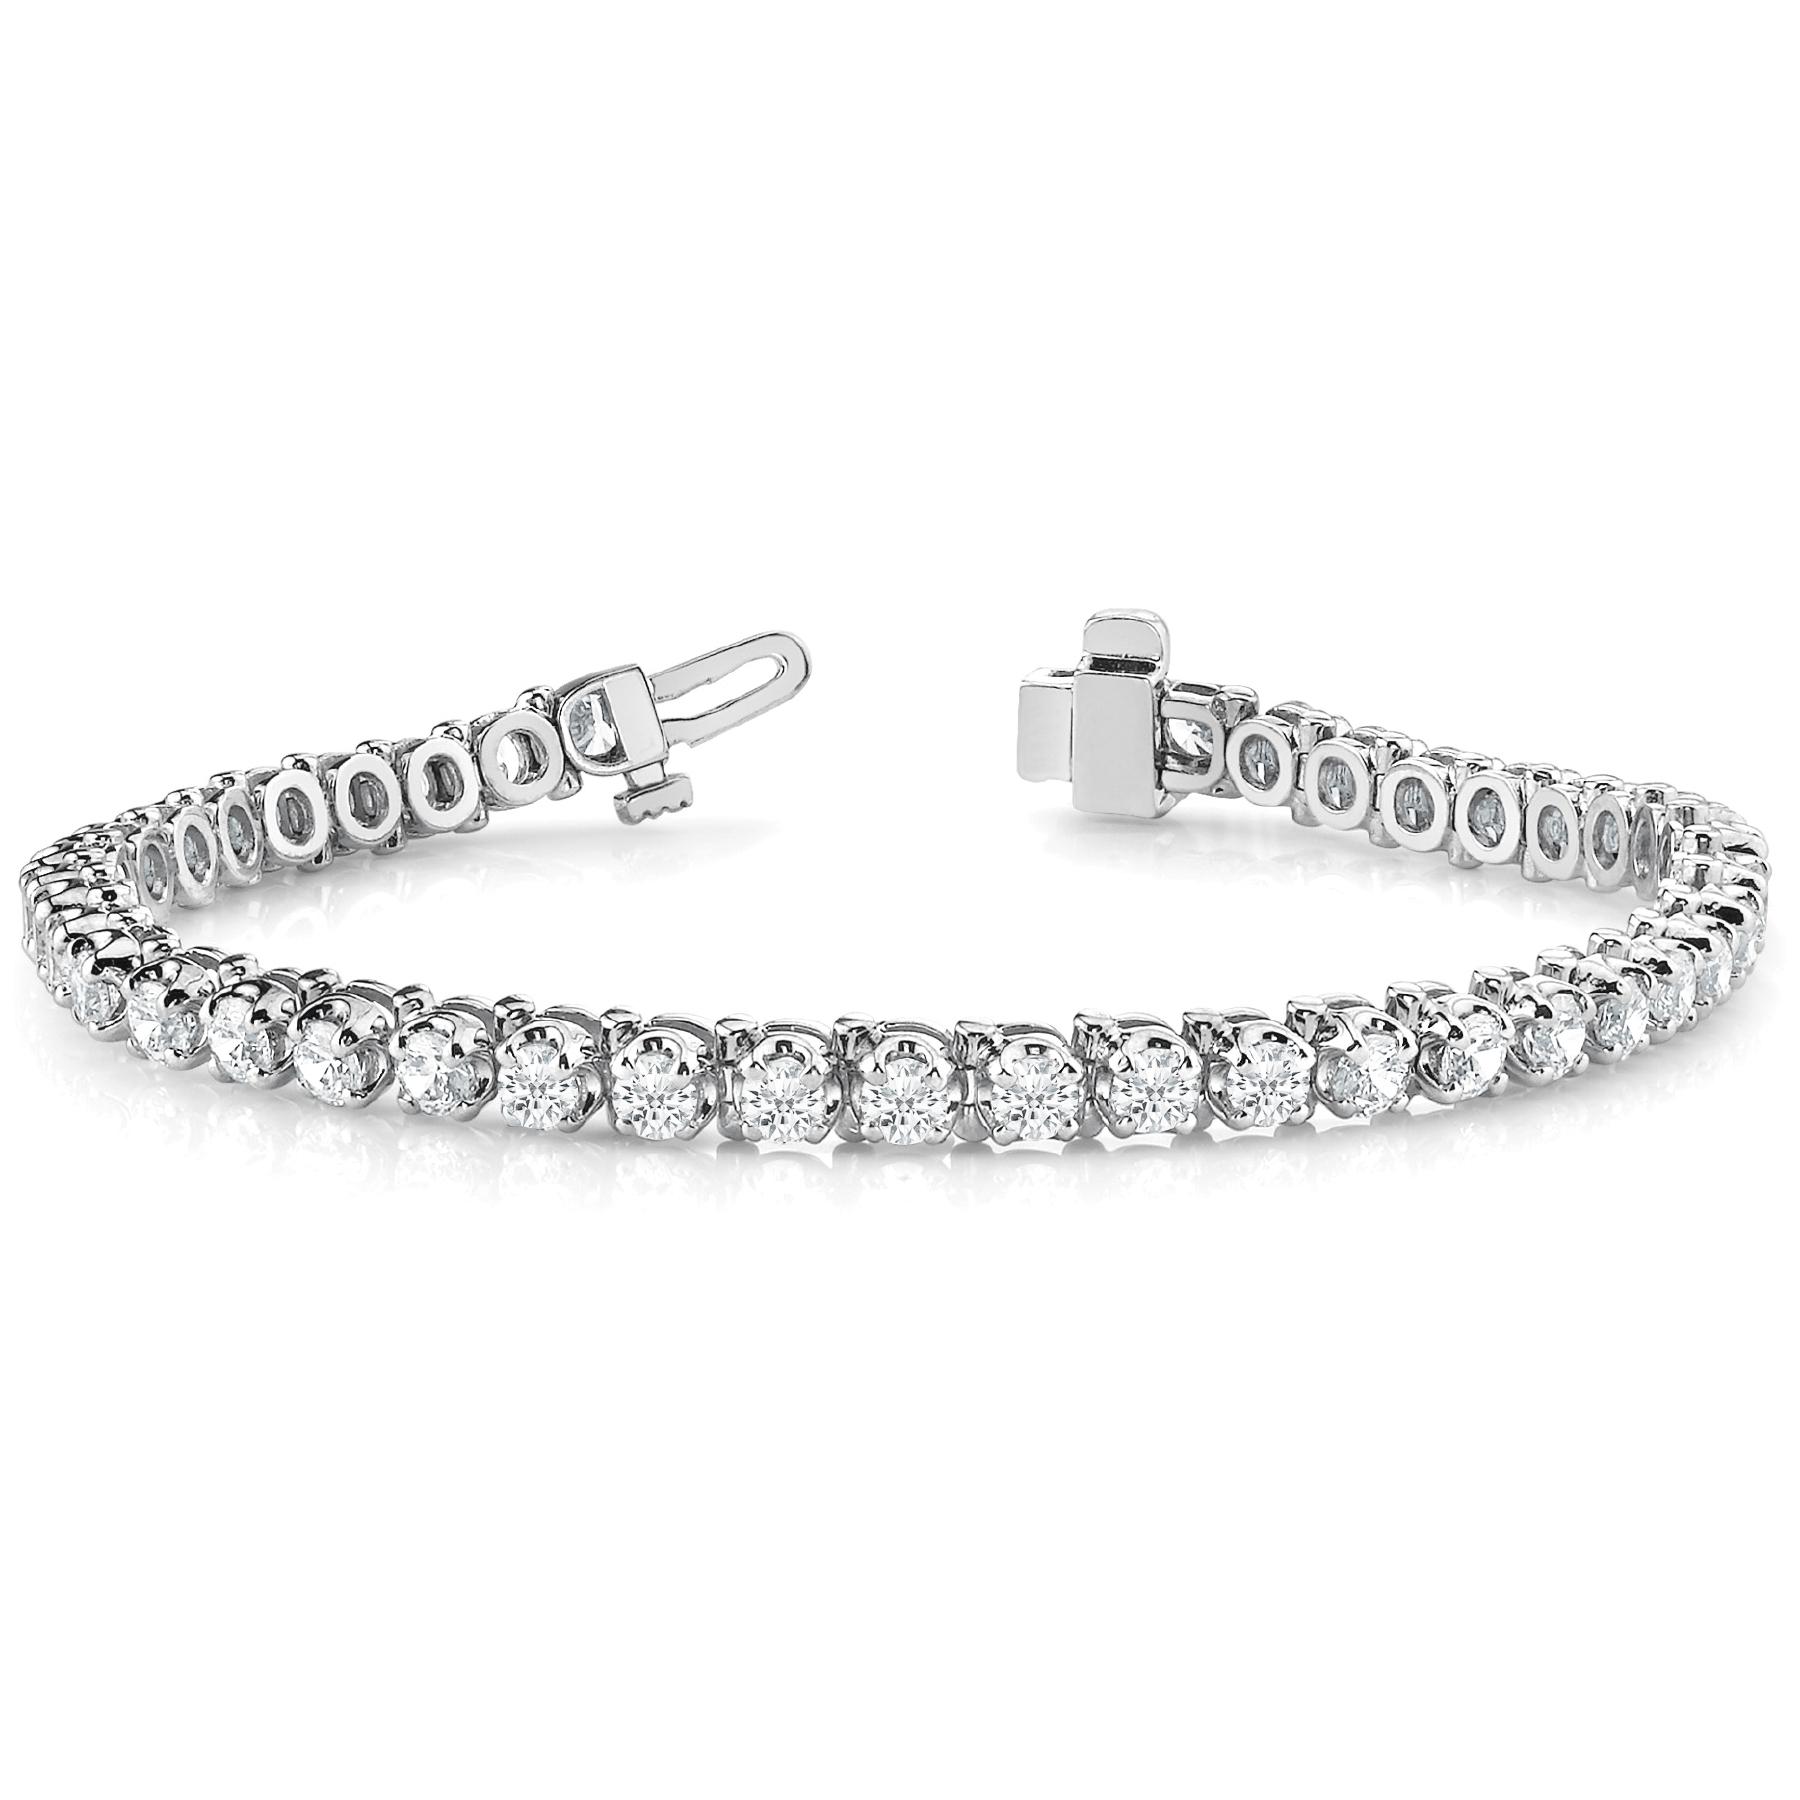 14k-white-gold-prong-set-tennis-diamond-bracelet-4488-04-05